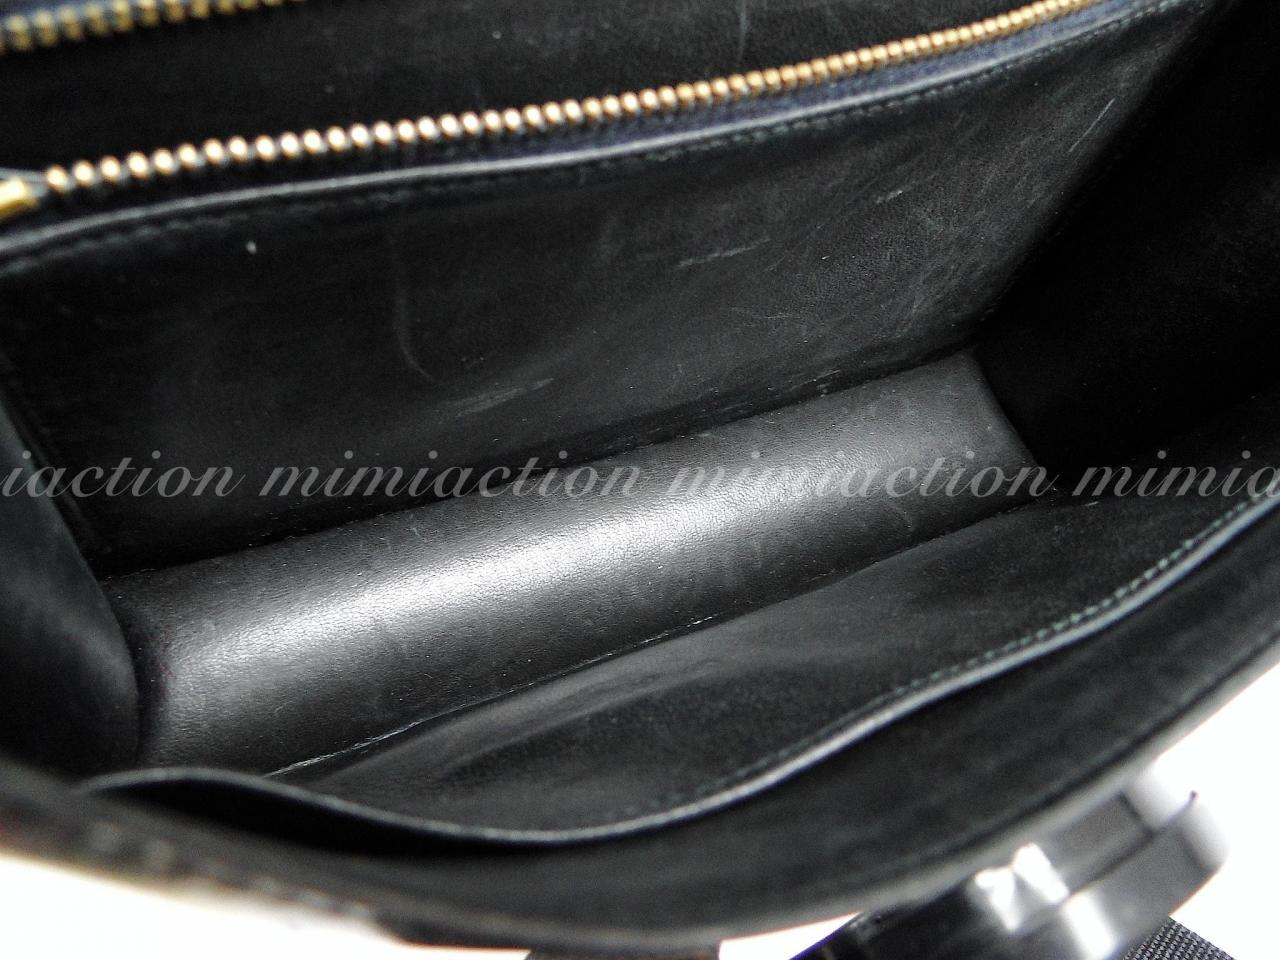 hermes passport - hermes bags repairs